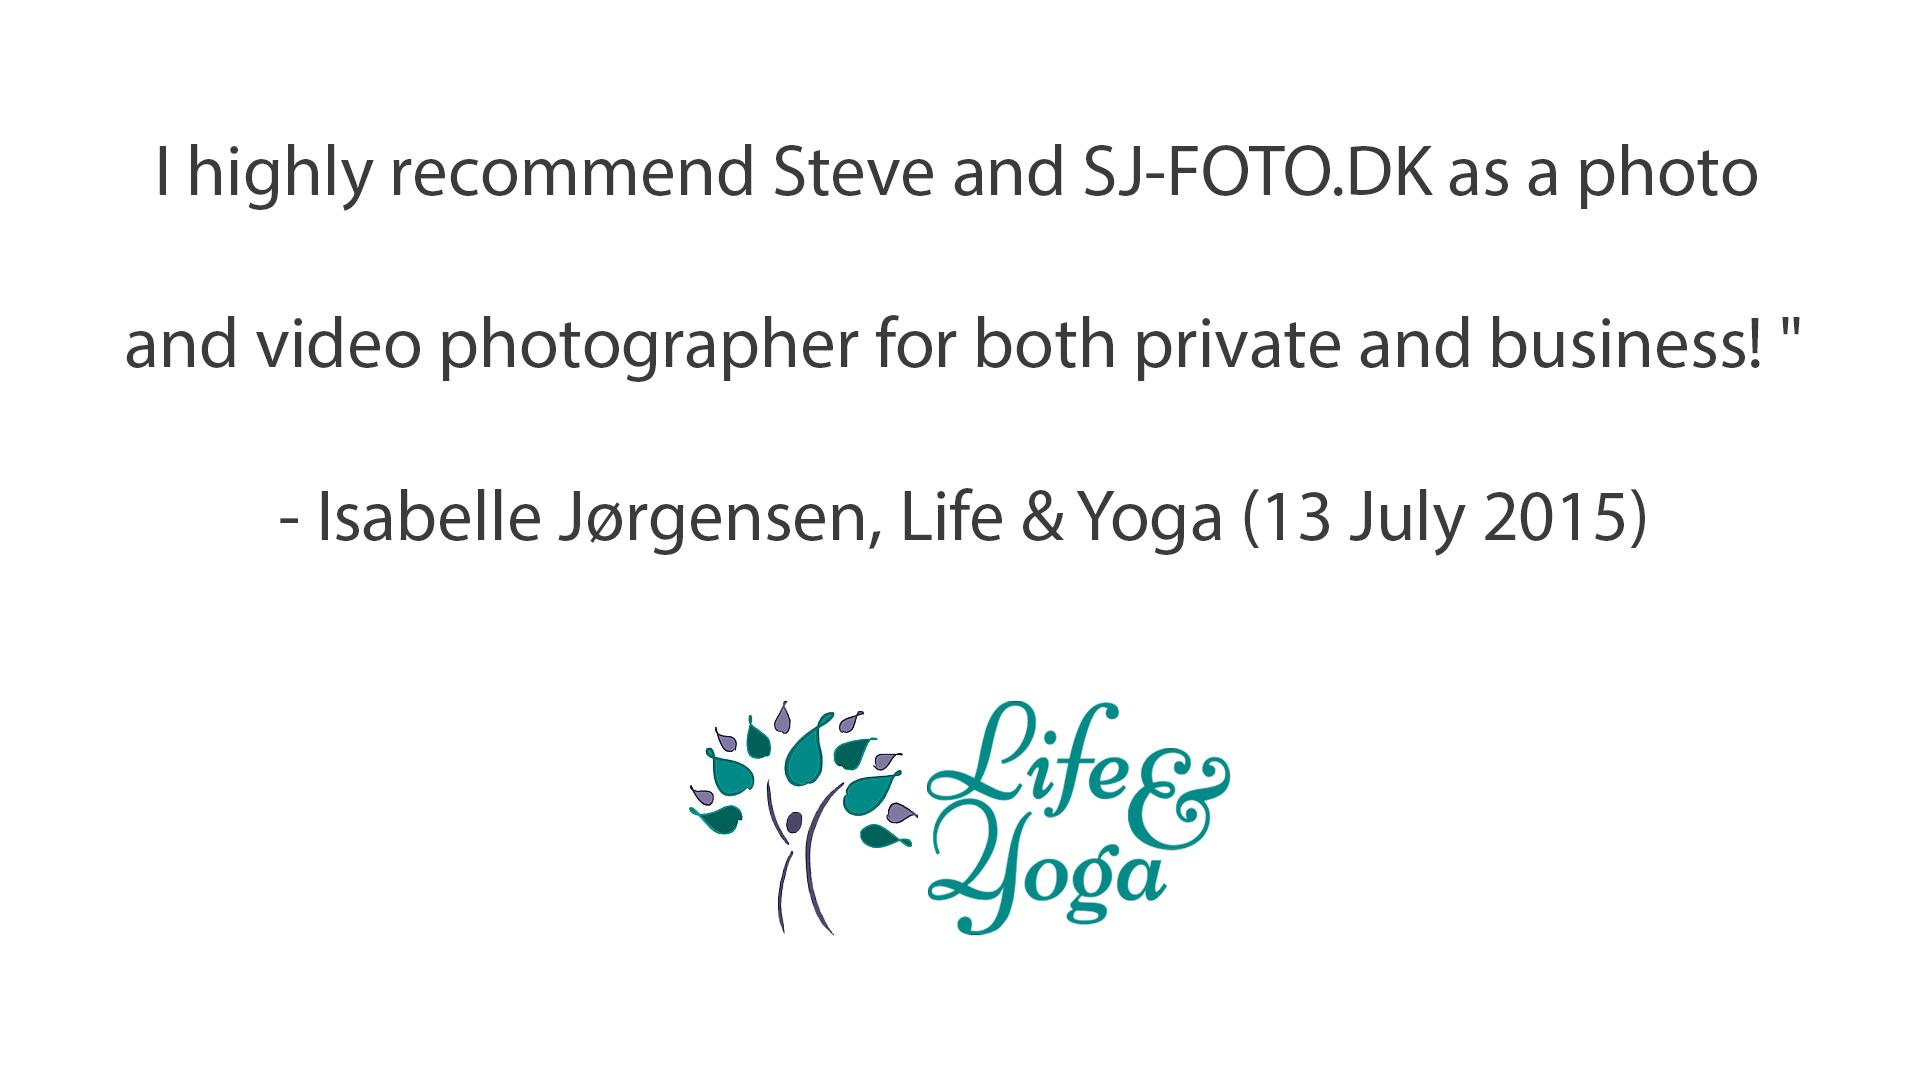 Life & Yoga